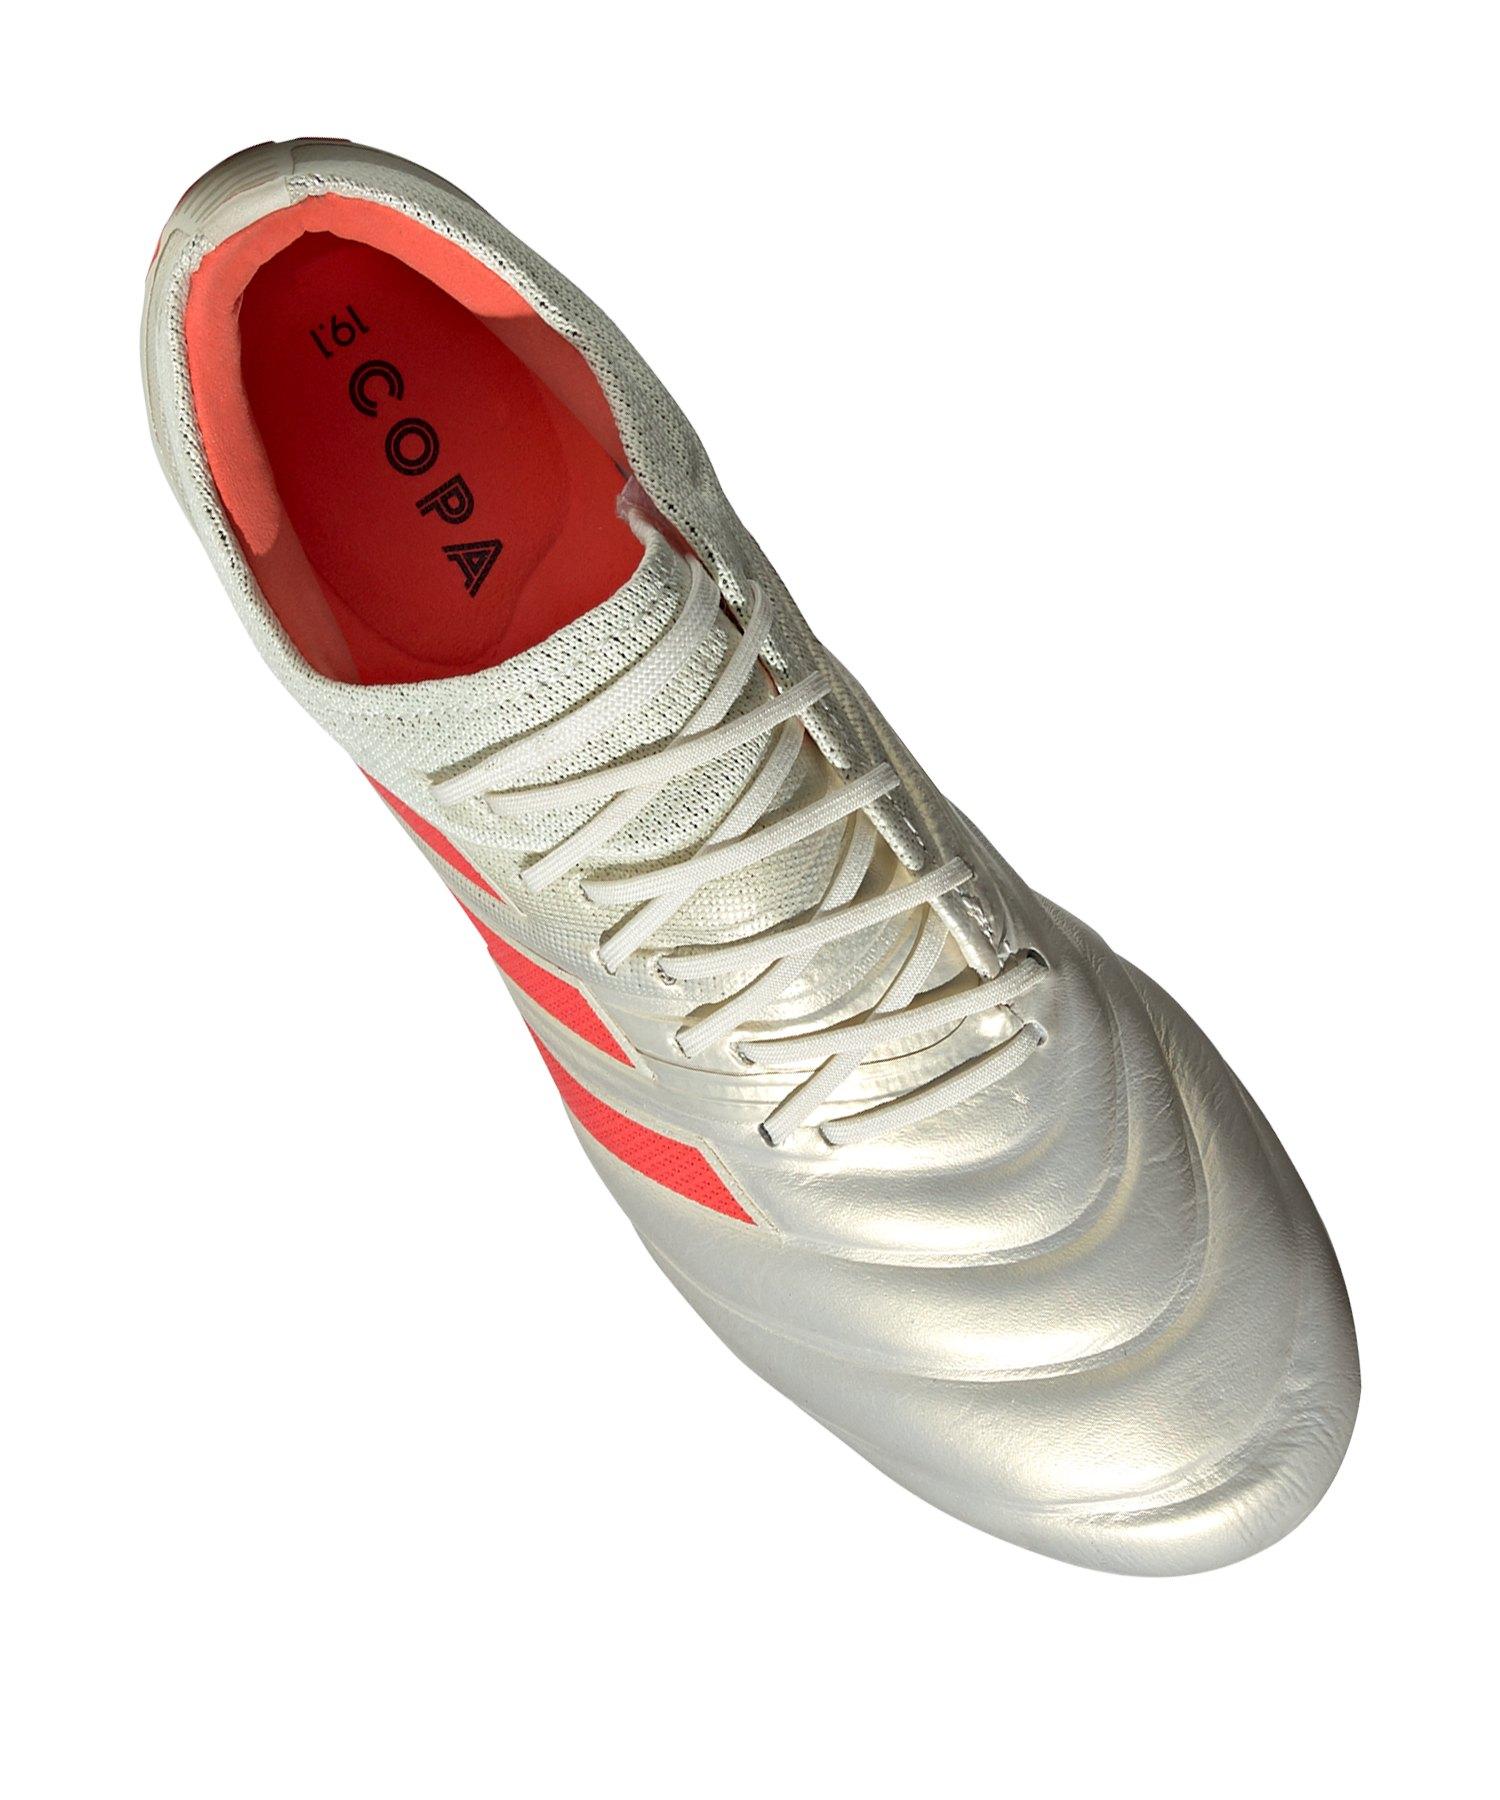 sports shoes 1a53f fedf1 adidas COPA 19.1 FG Weiss Rot  Fussballschuhe  Rasen  Ballgefühl   Nocken  10107590